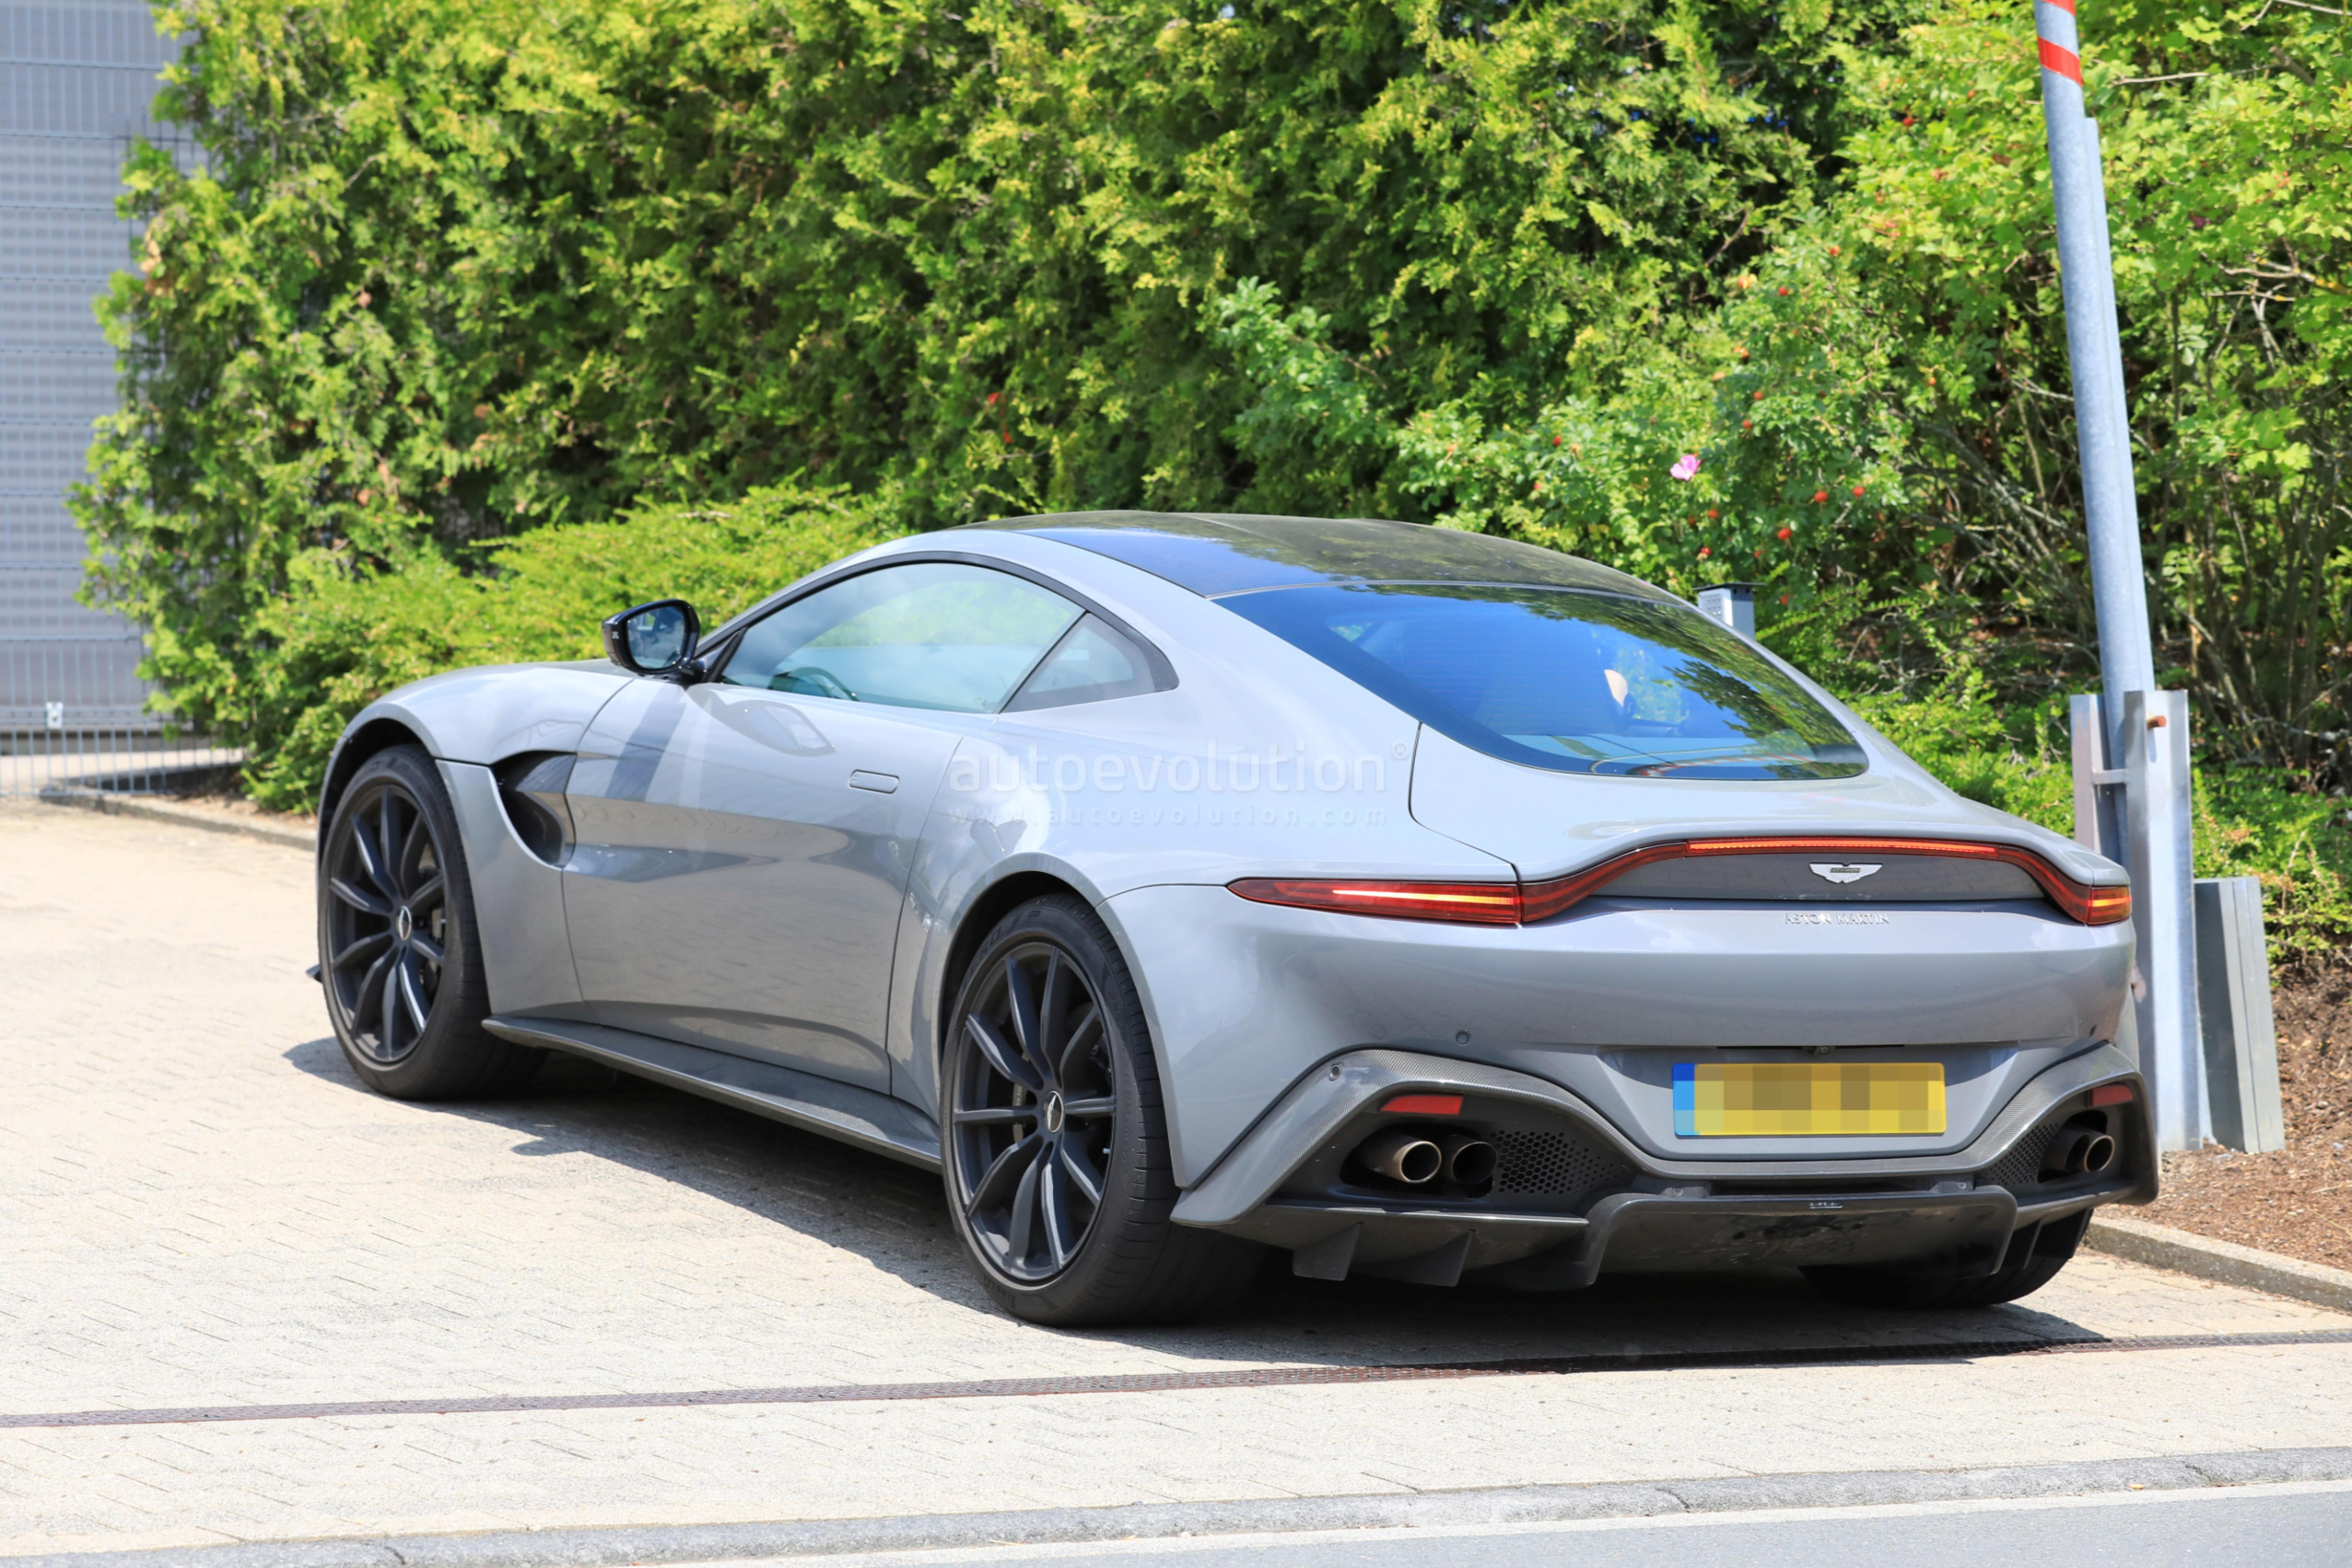 Aston Martin Vantage S Test Mule Spied Near The Nurburgring